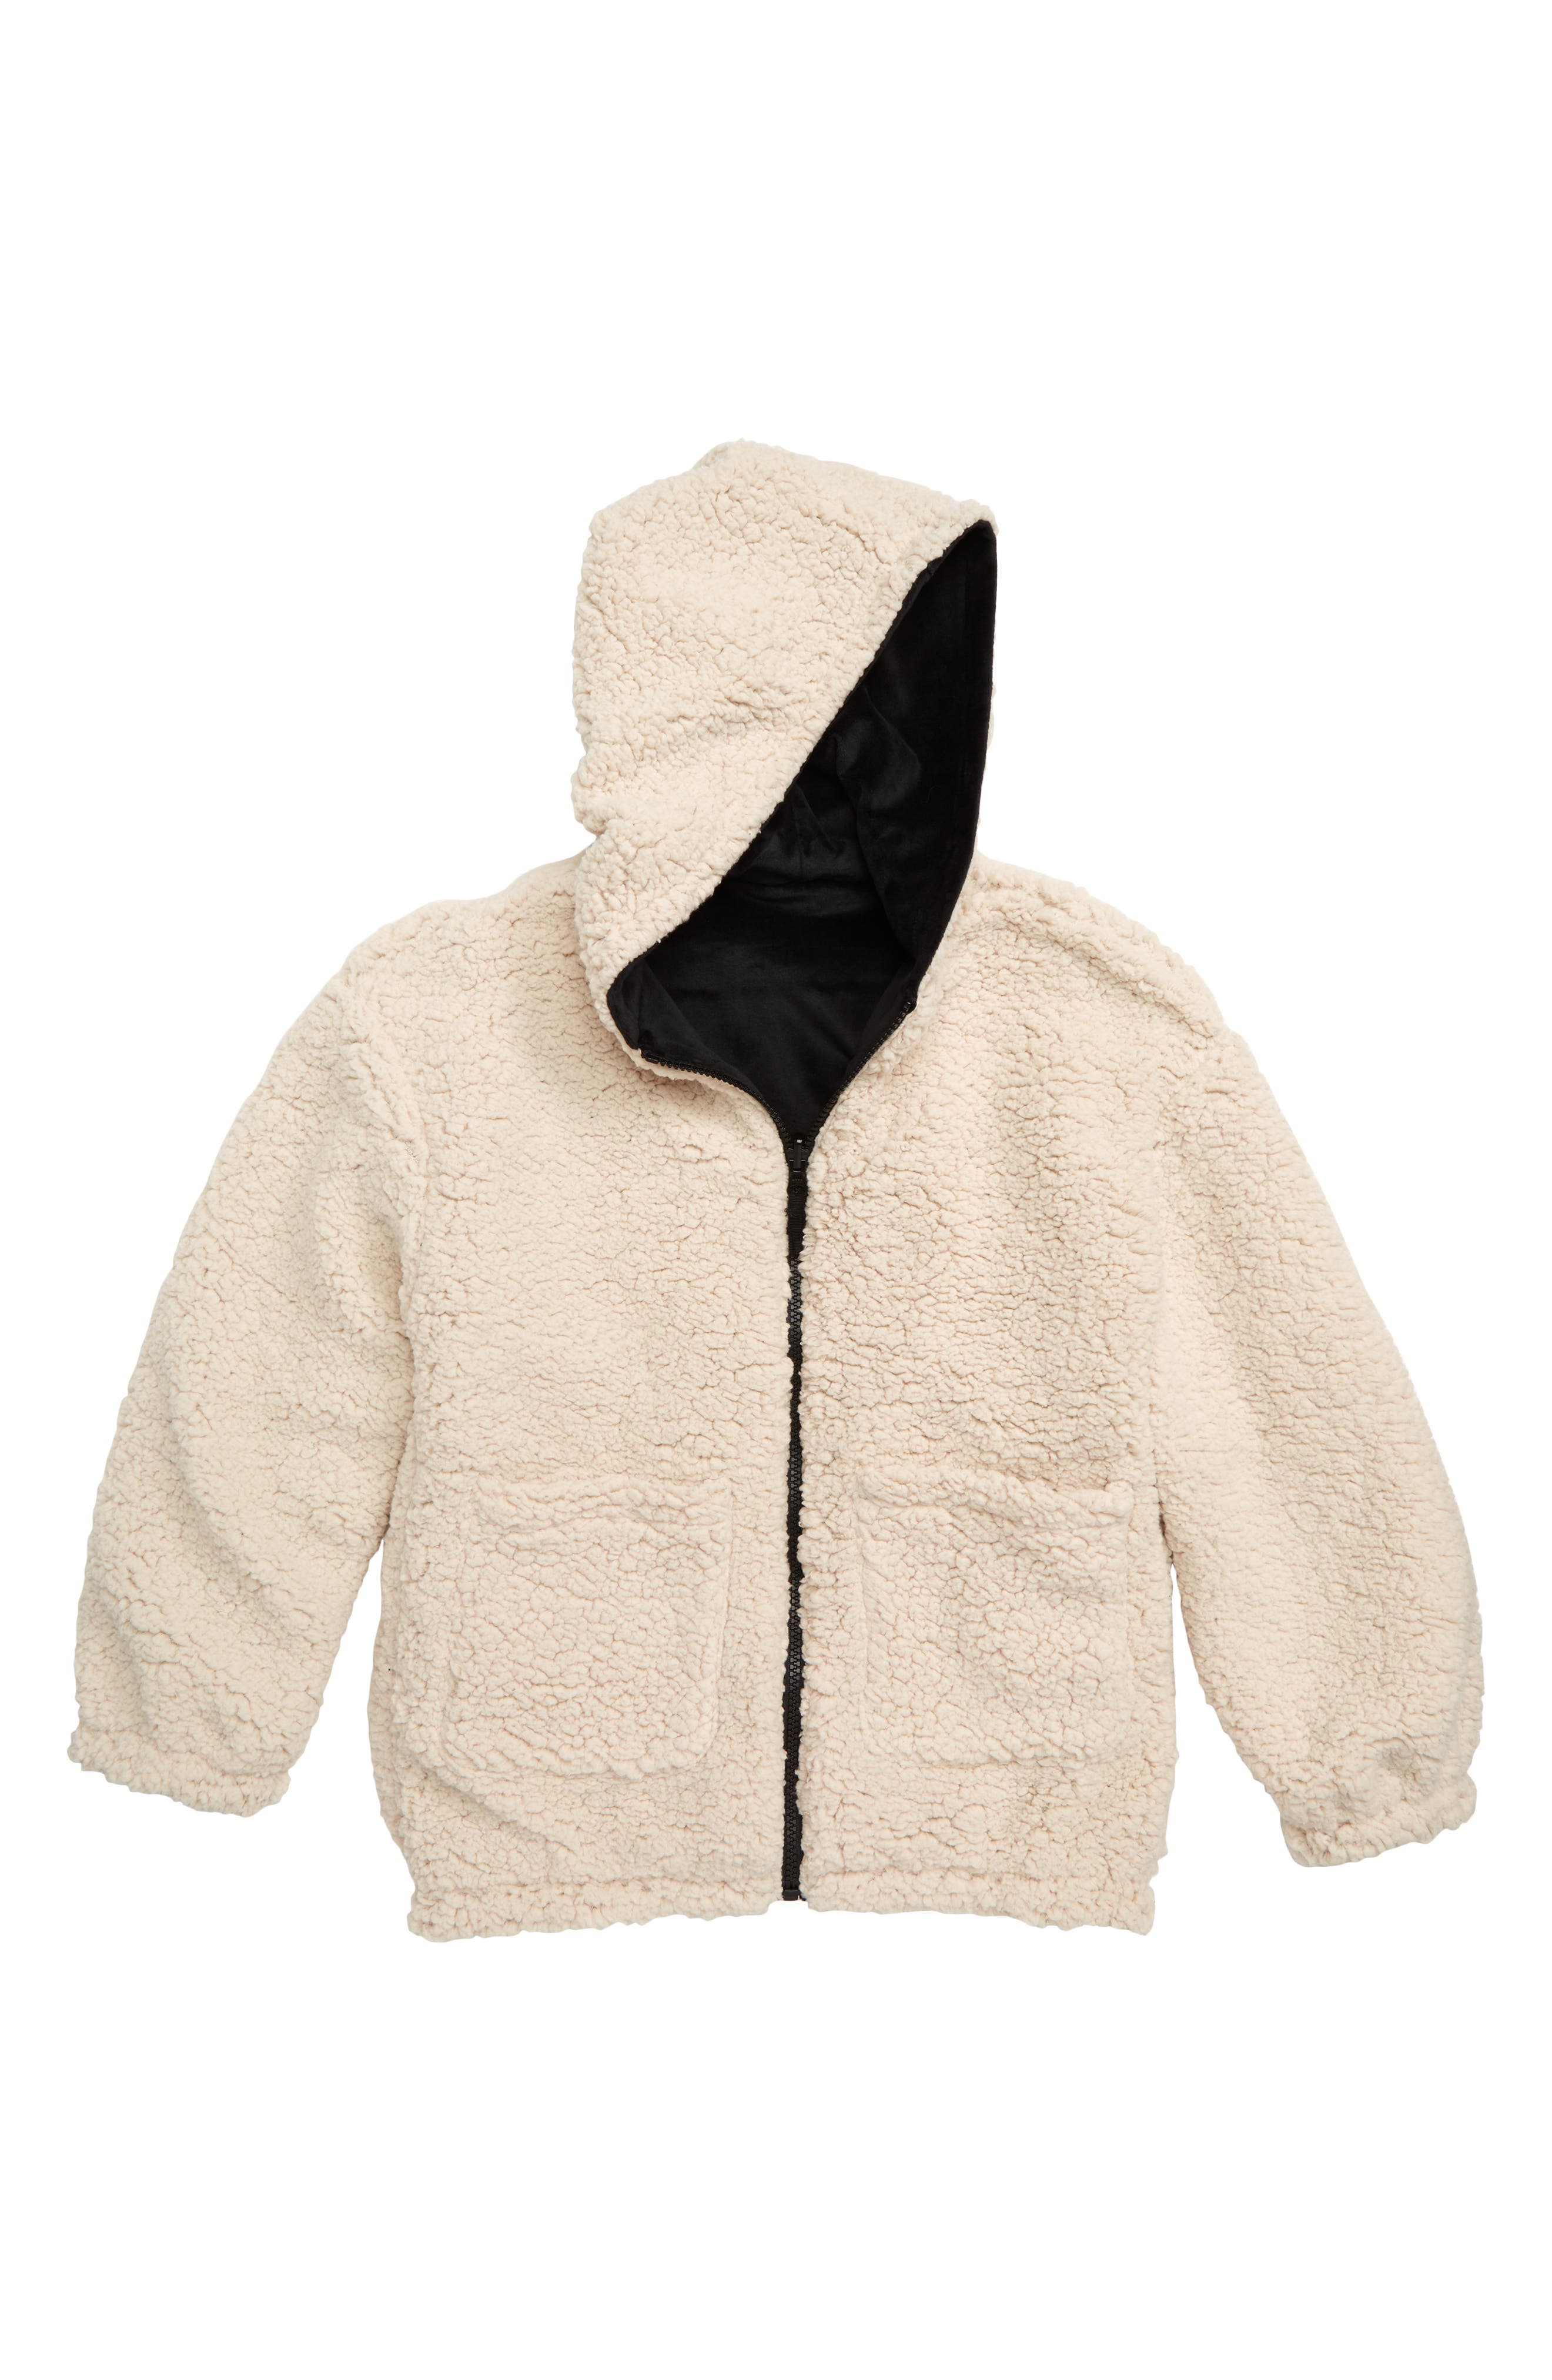 Reversible Hooded Jacket,                             Alternate thumbnail 2, color,                             BLACK